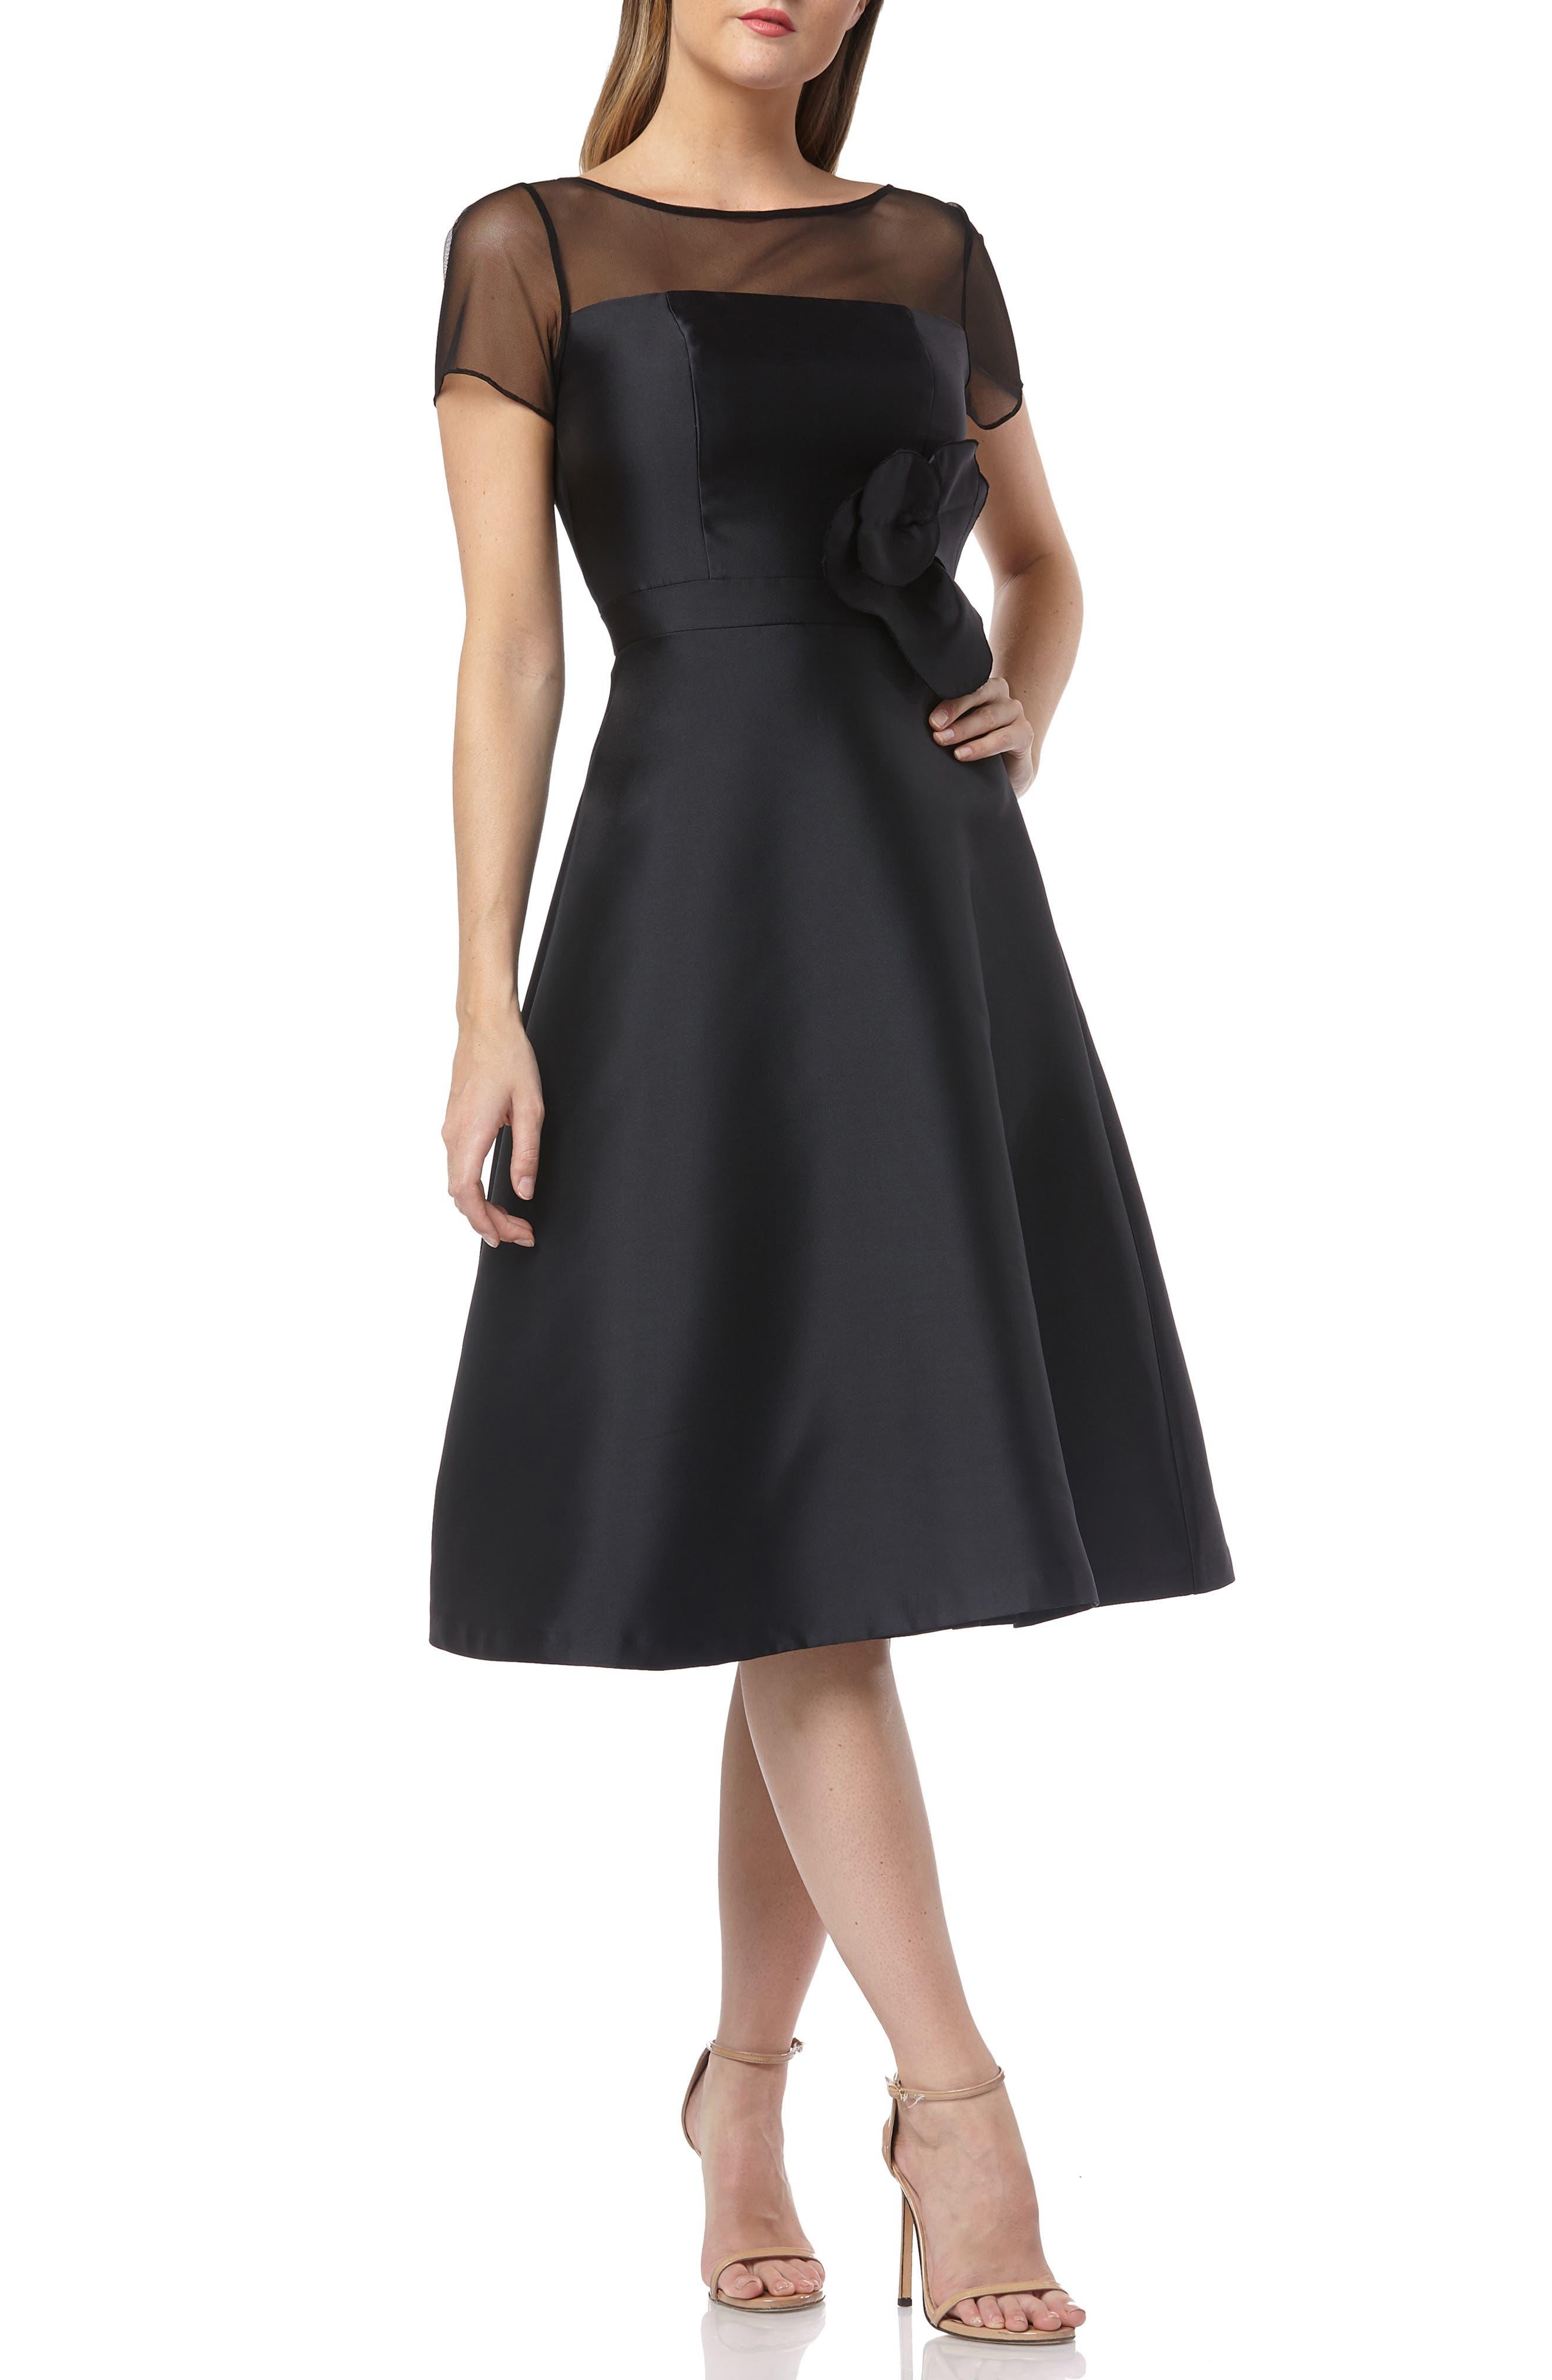 KAY UNGER Illusion Yoke Fit & Flare Cocktail Dress, Main, color, BLACK